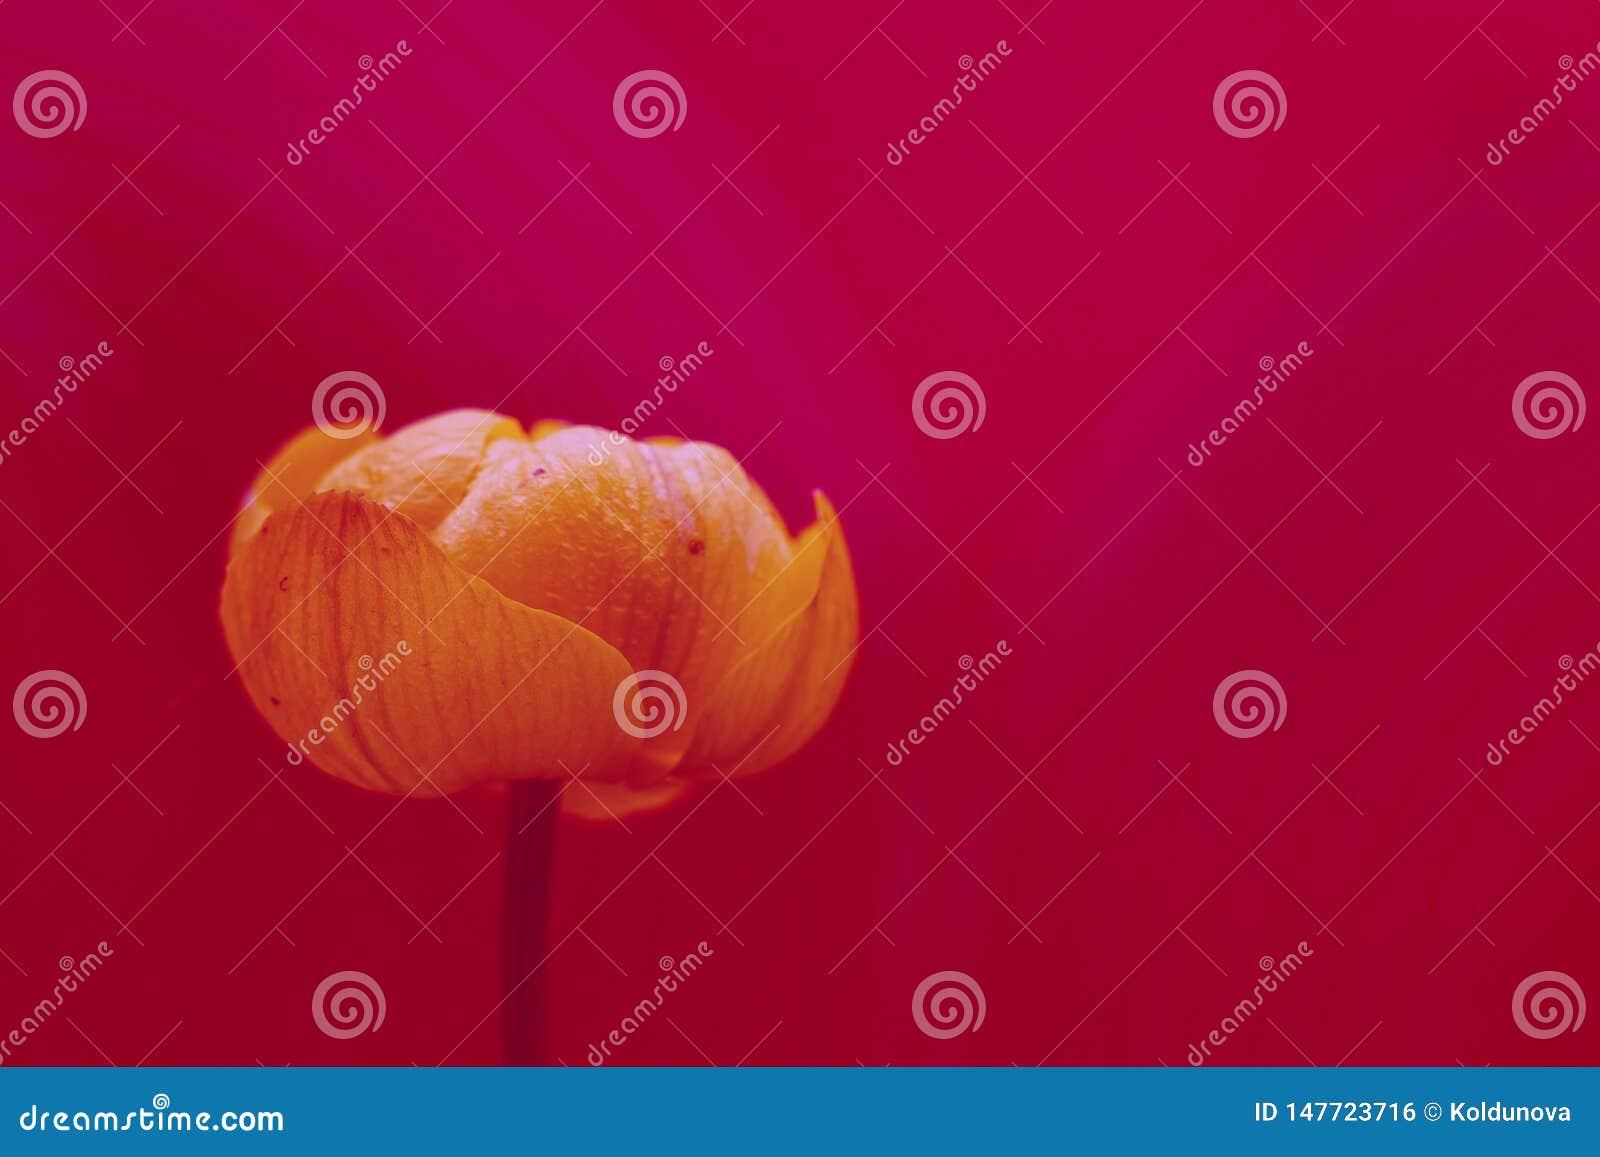 Flower Trollius europaeus. Beautiful, bright filtered photo. Macro